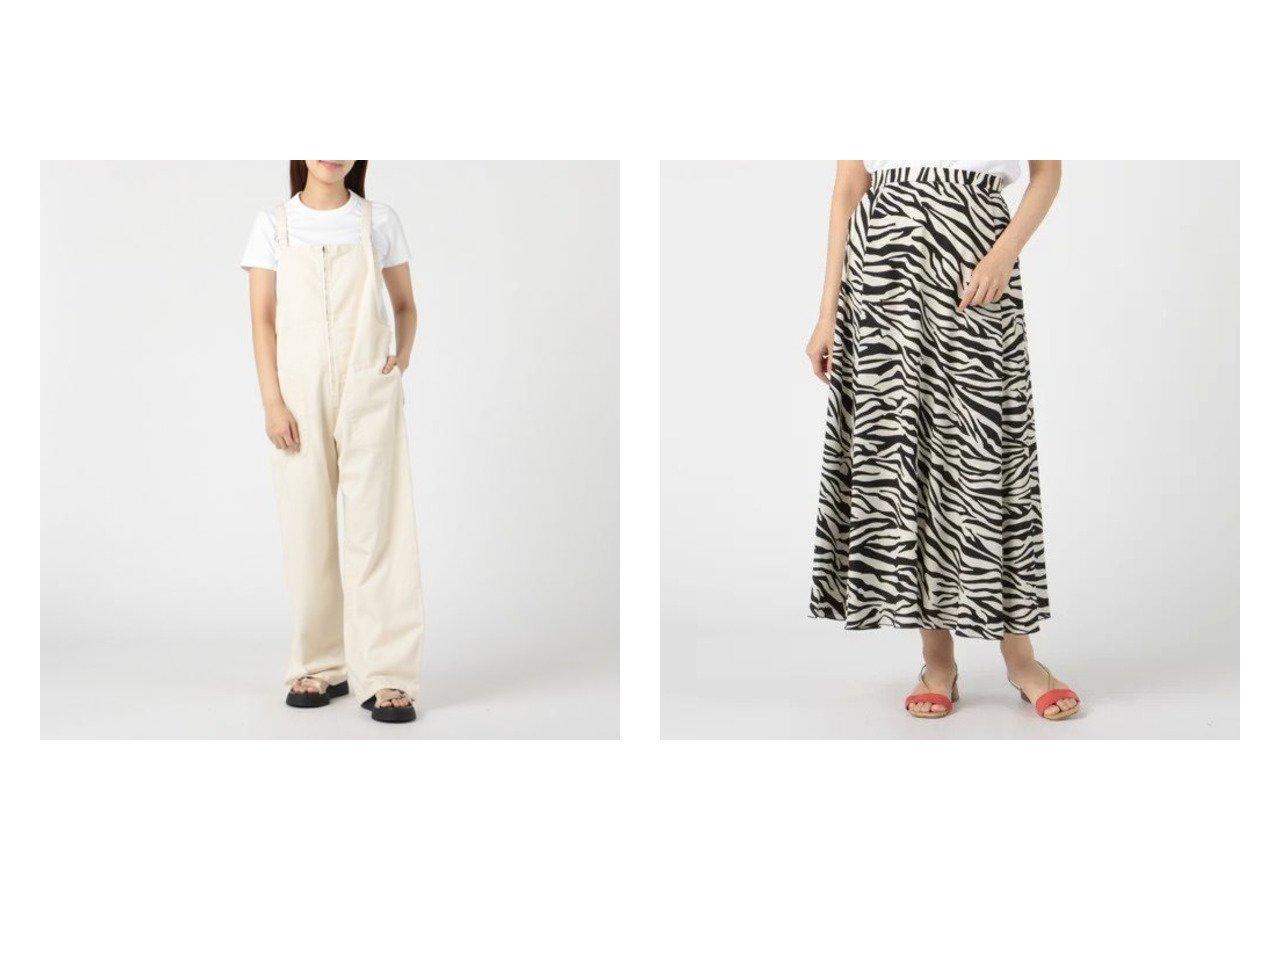 【Munich/ミューニック】の10oz ecru denim salopette&zebra printed crepe dechine flare skirt おすすめ!人気、トレンド・レディースファッションの通販 おすすめで人気の流行・トレンド、ファッションの通販商品 インテリア・家具・メンズファッション・キッズファッション・レディースファッション・服の通販 founy(ファニー) https://founy.com/ ファッション Fashion レディースファッション WOMEN ワンピース Dress オールインワン ワンピース All In One Dress サロペット Salopette スカート Skirt サロペット スクエア ストレート デニム ポケット ワイド 洗える  ID:crp329100000062510